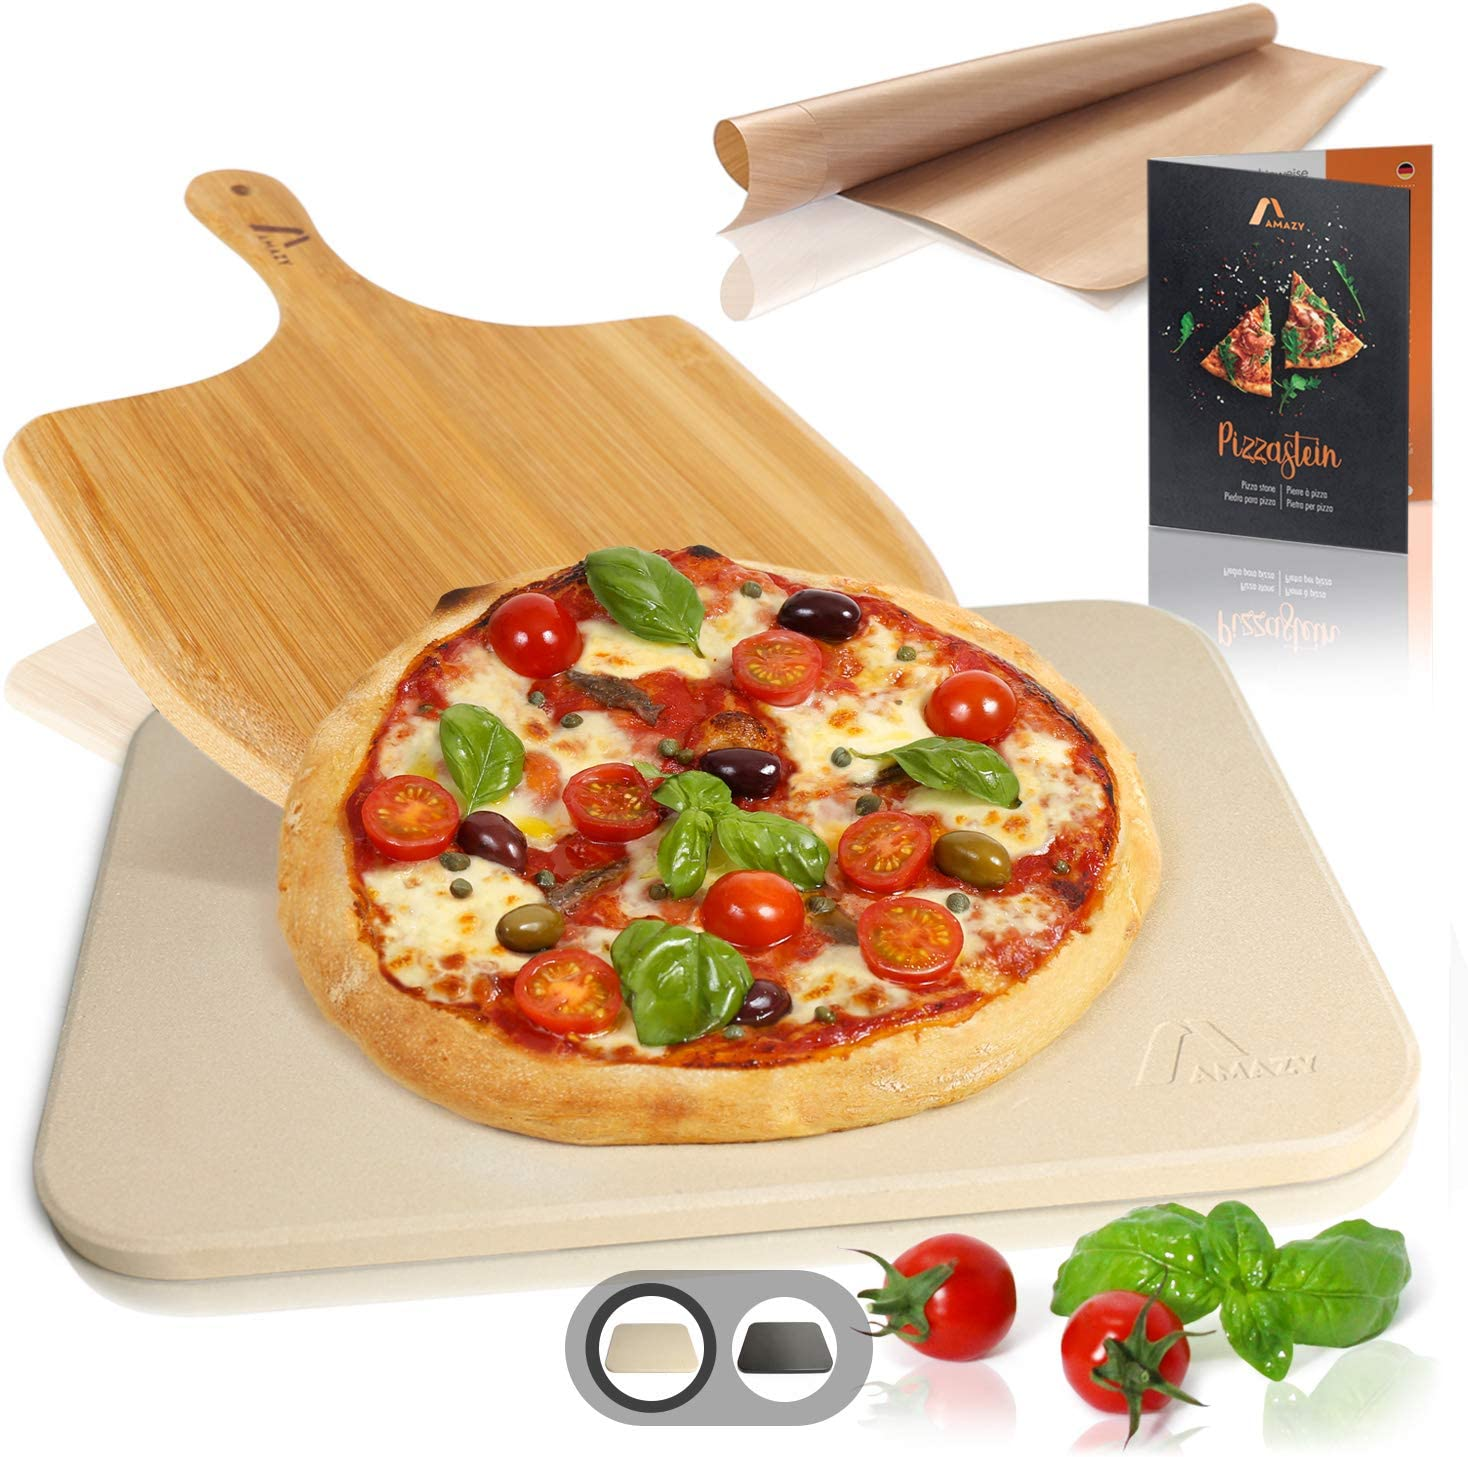 Amazy Pizzastein inkl. Bambus Pizzaschaufel